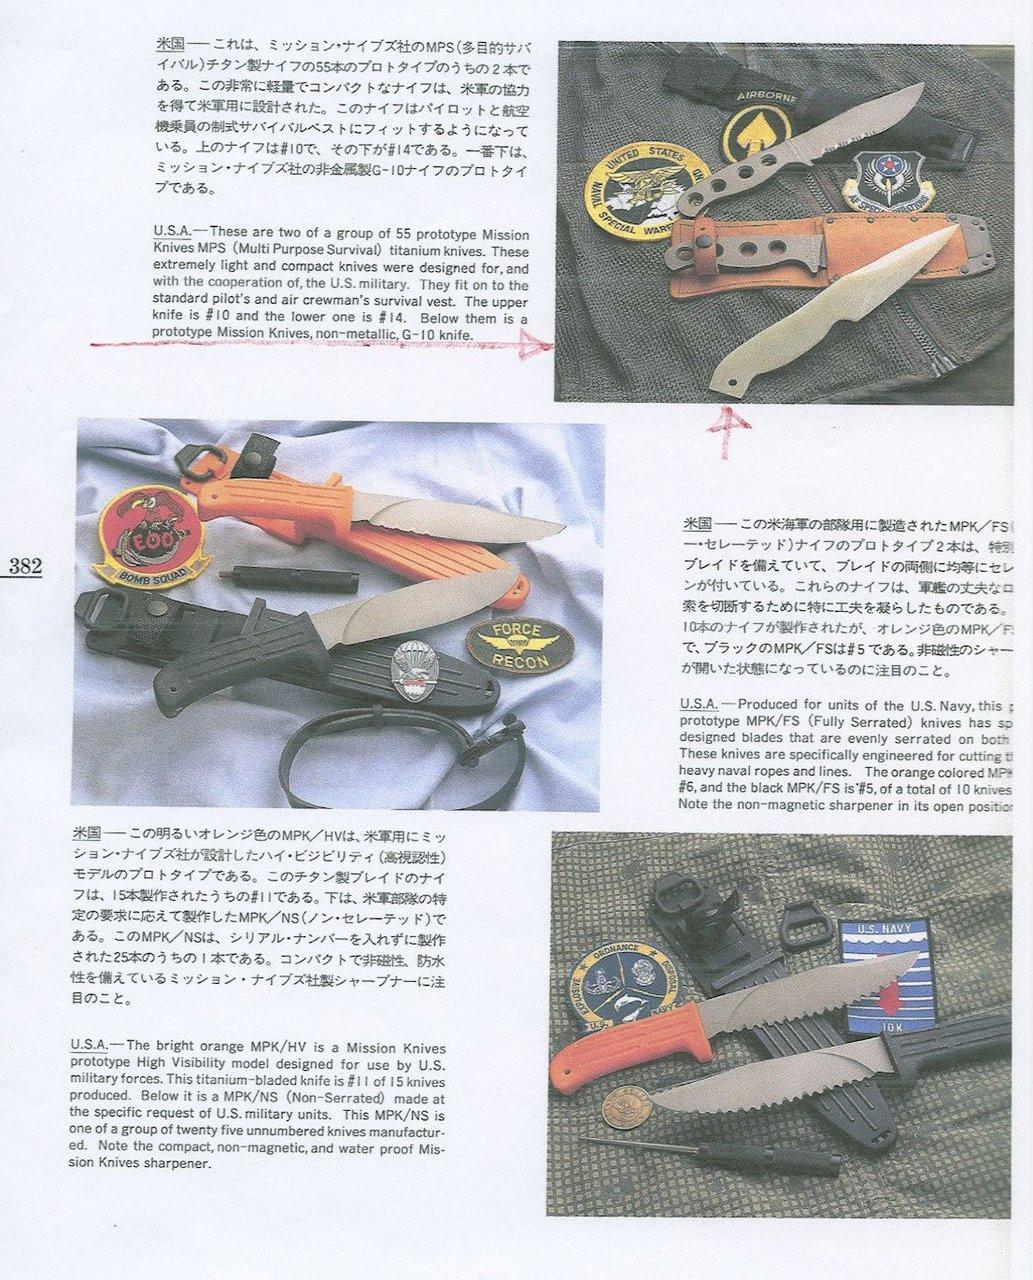 Prototype Mission Knife - M4245